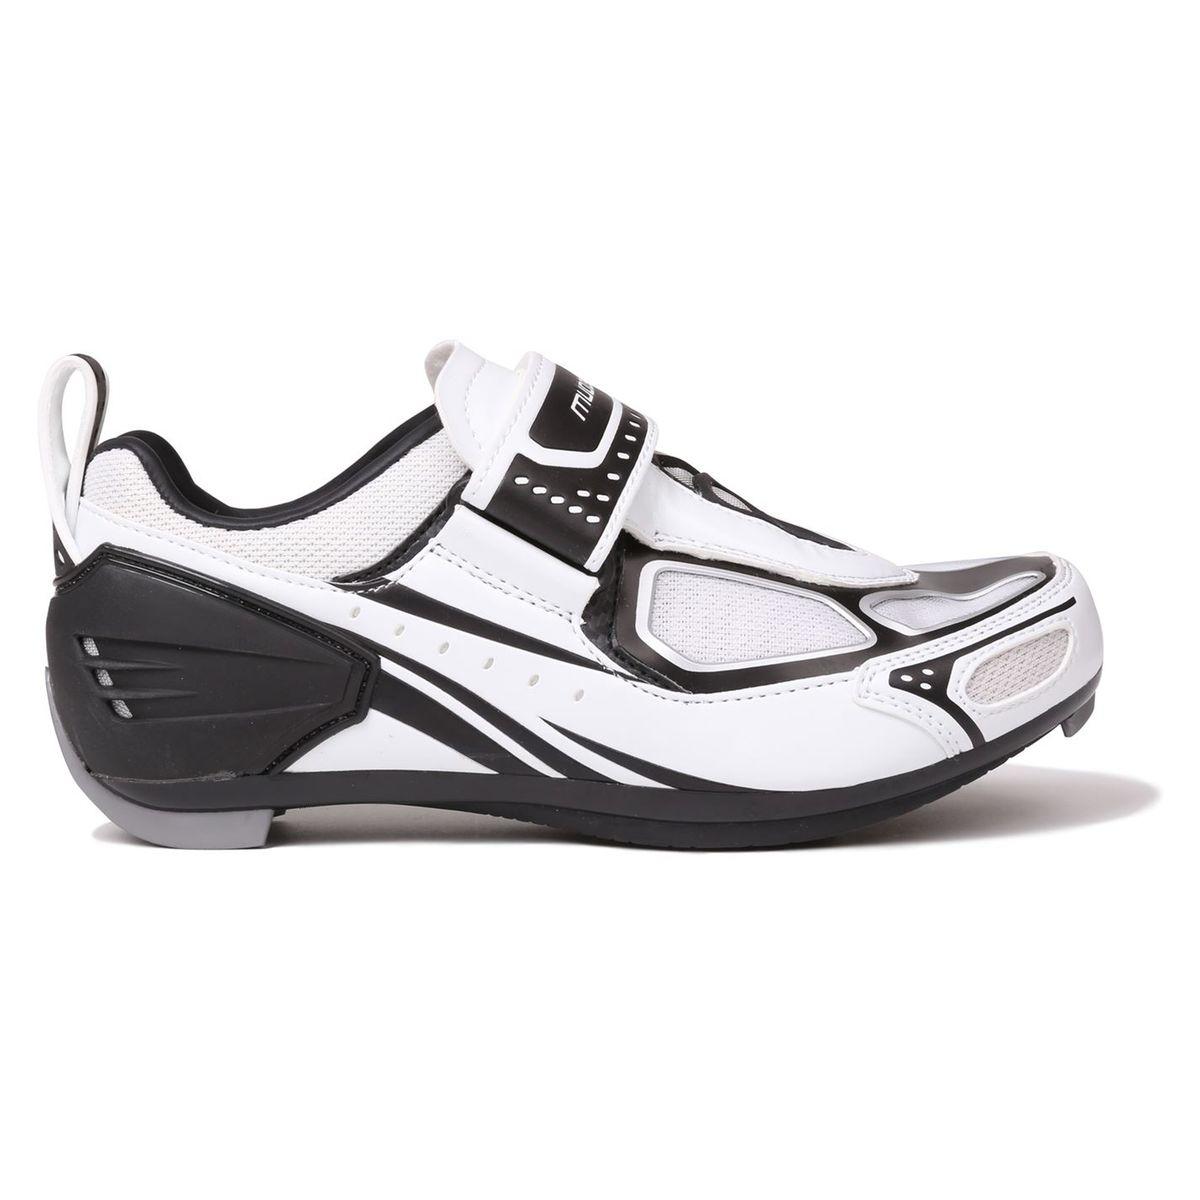 Chaussures de vélo triathlon